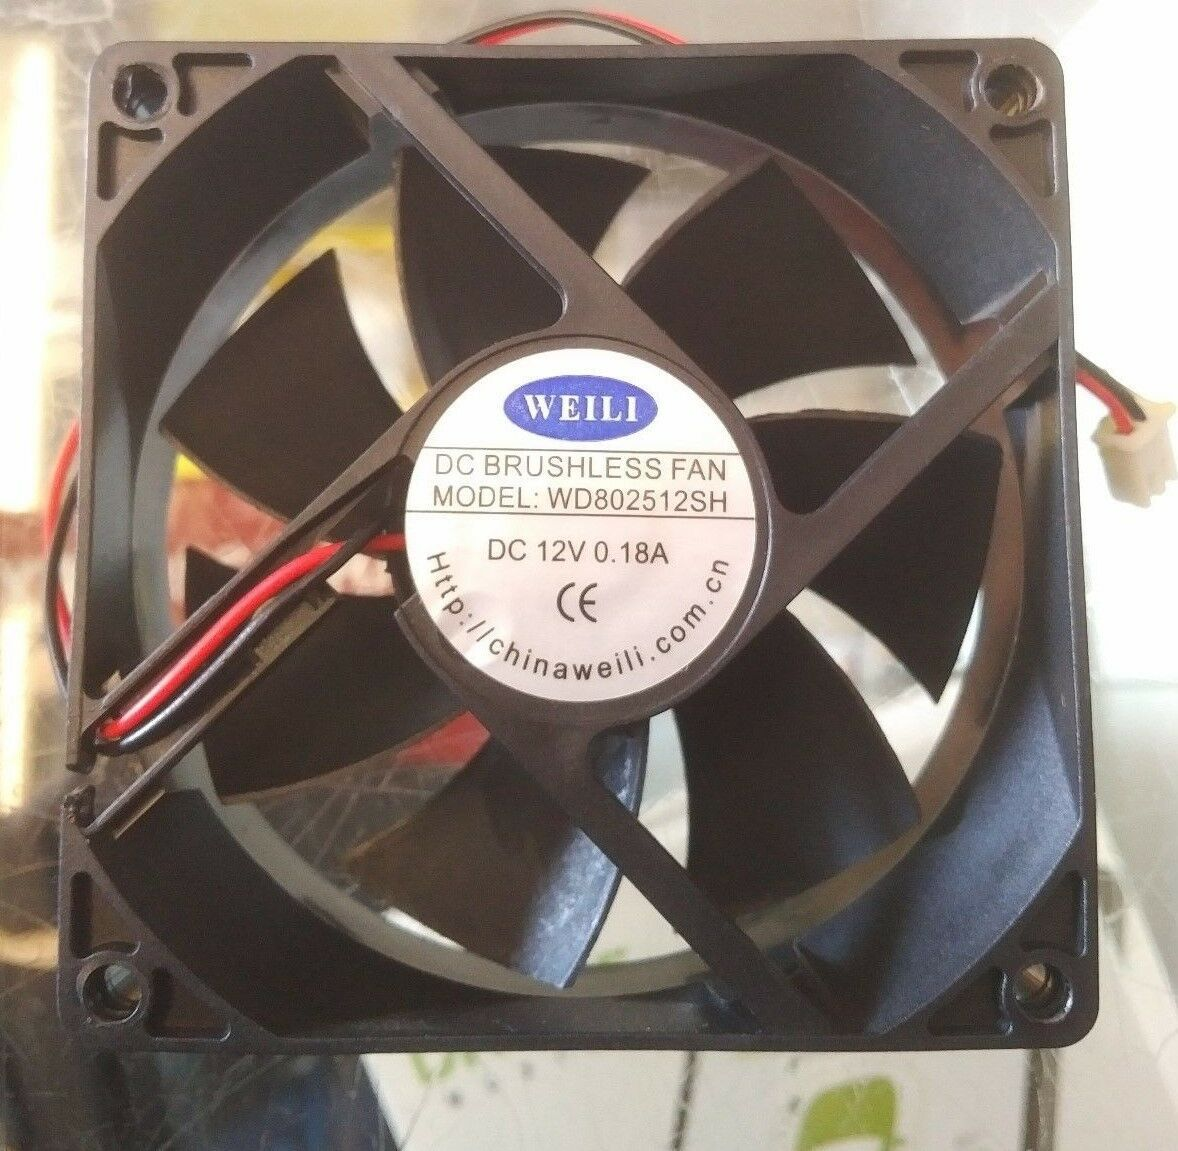 "WEILI WD802512SH DC 12 VOLT BRUSHLESS FAN 3.15""inch/80mm25mm"